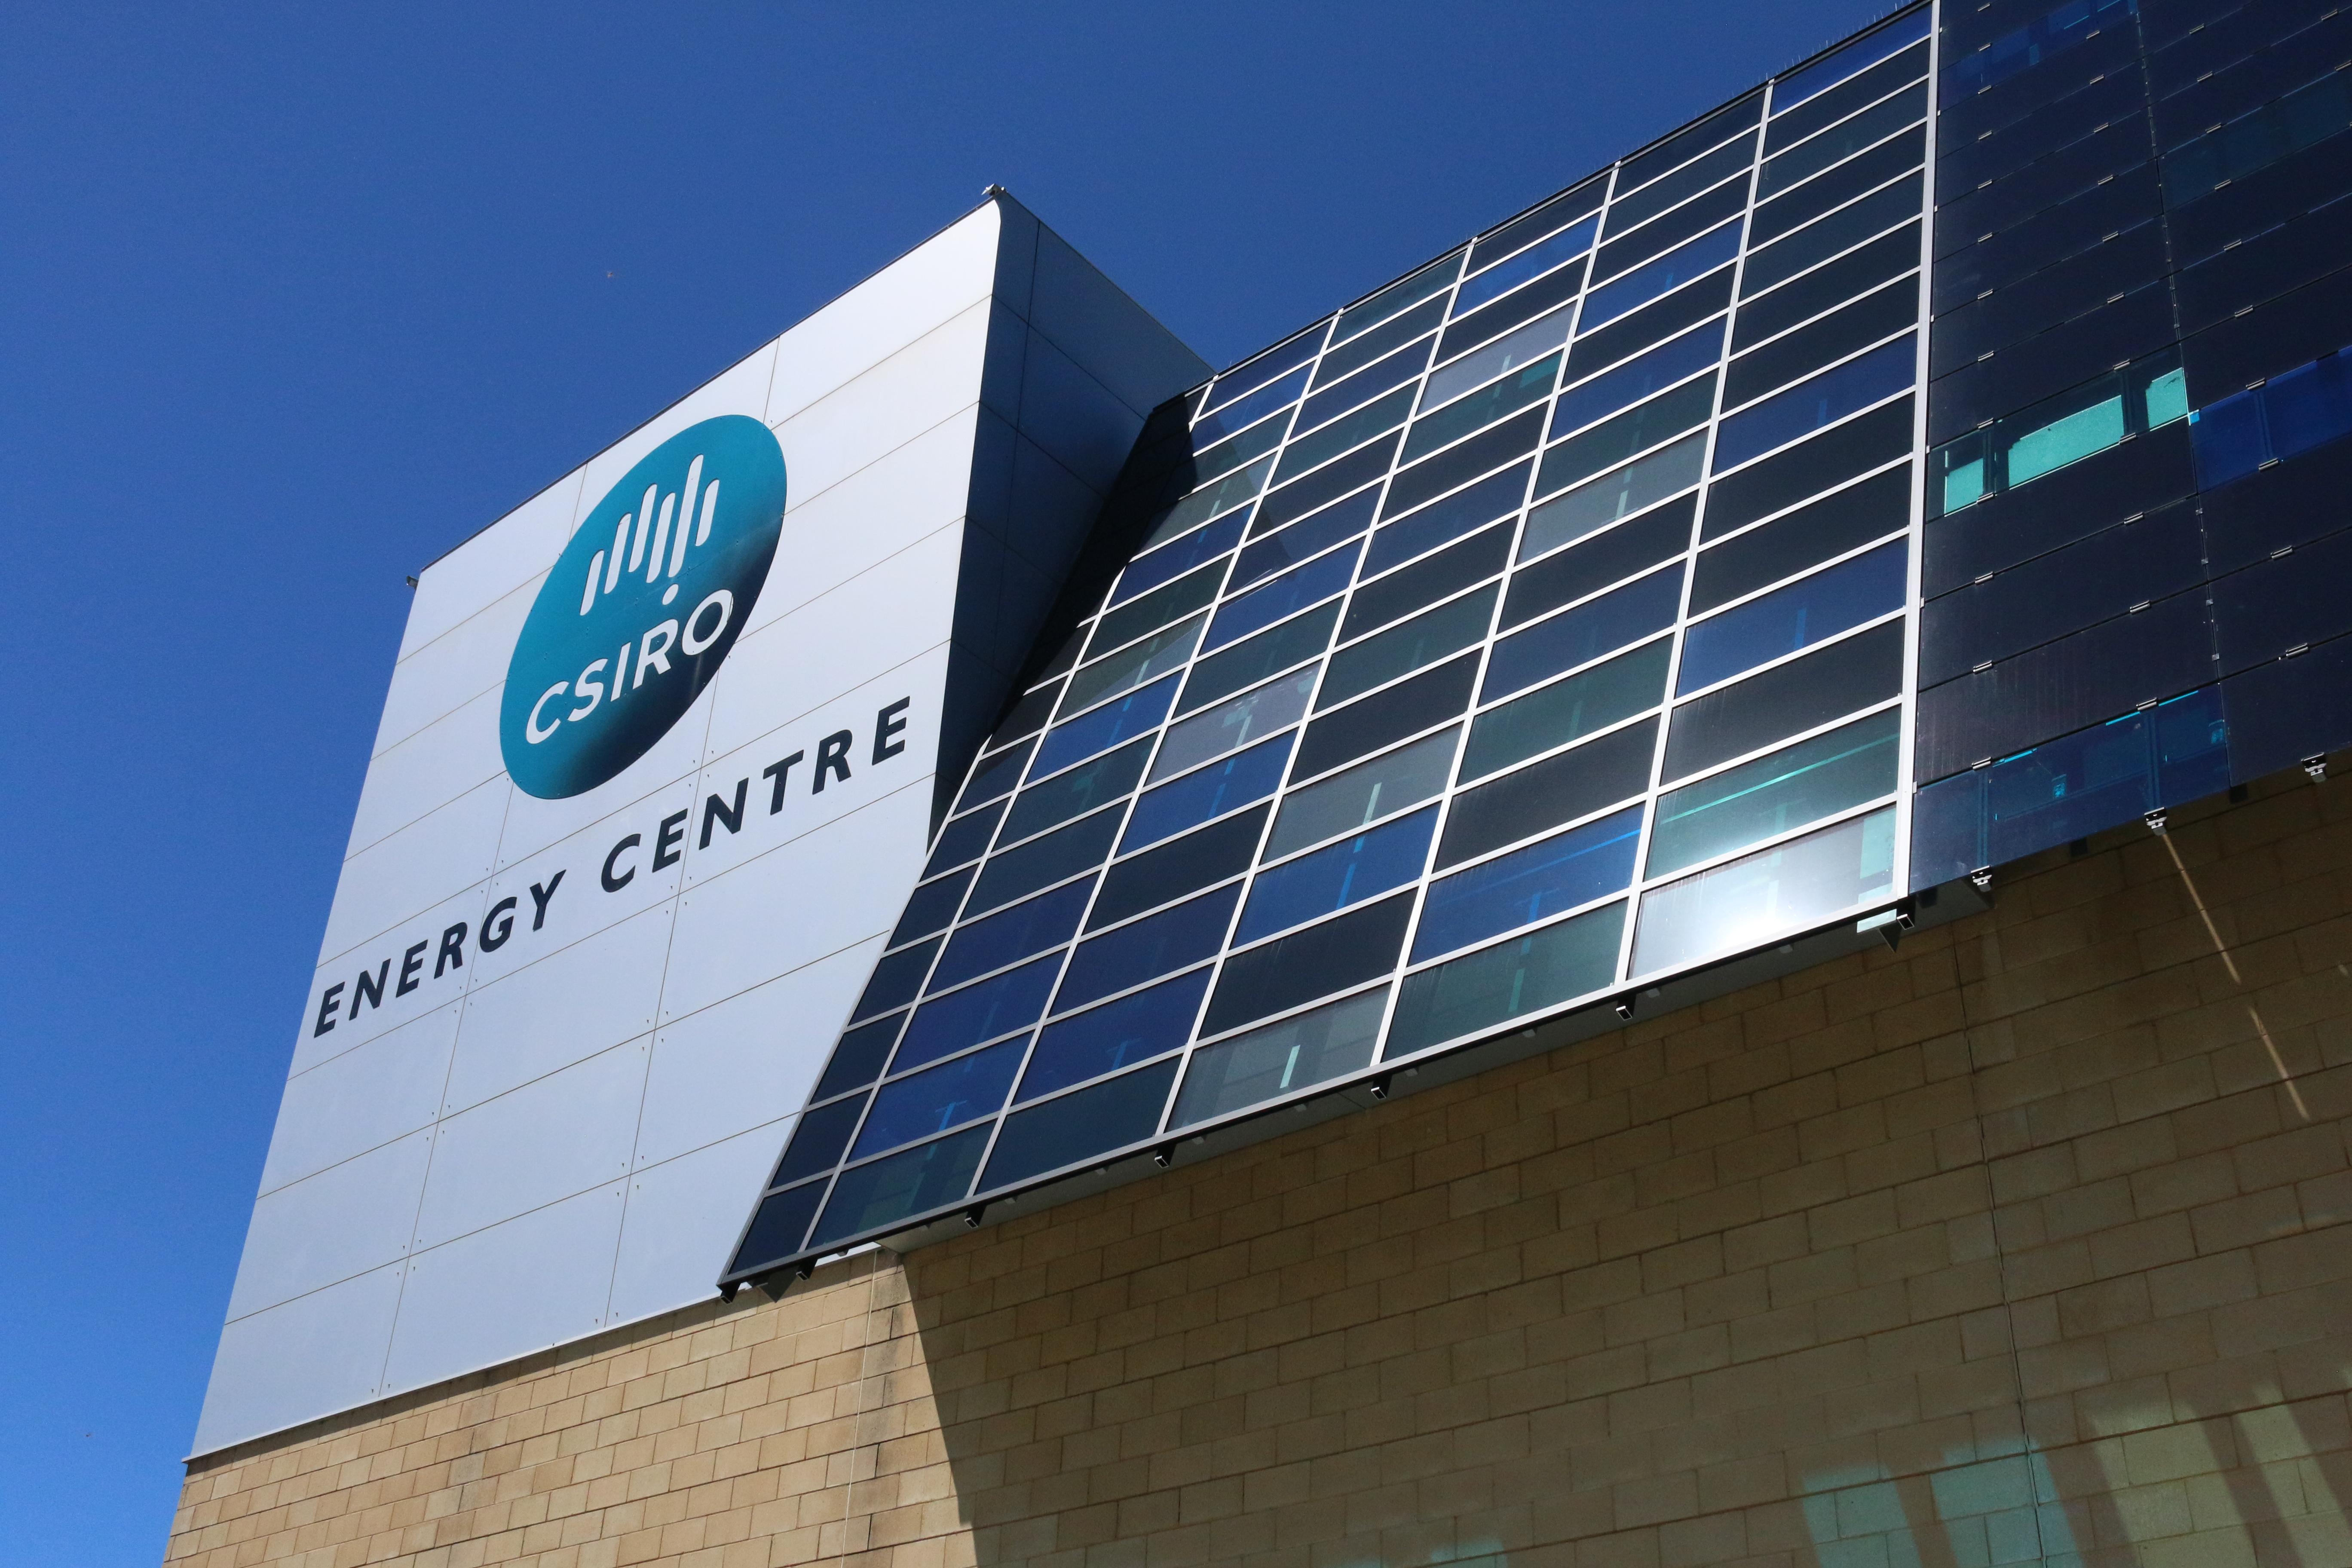 Our Energy Centre Gets A Solar Facelift Csiroscope